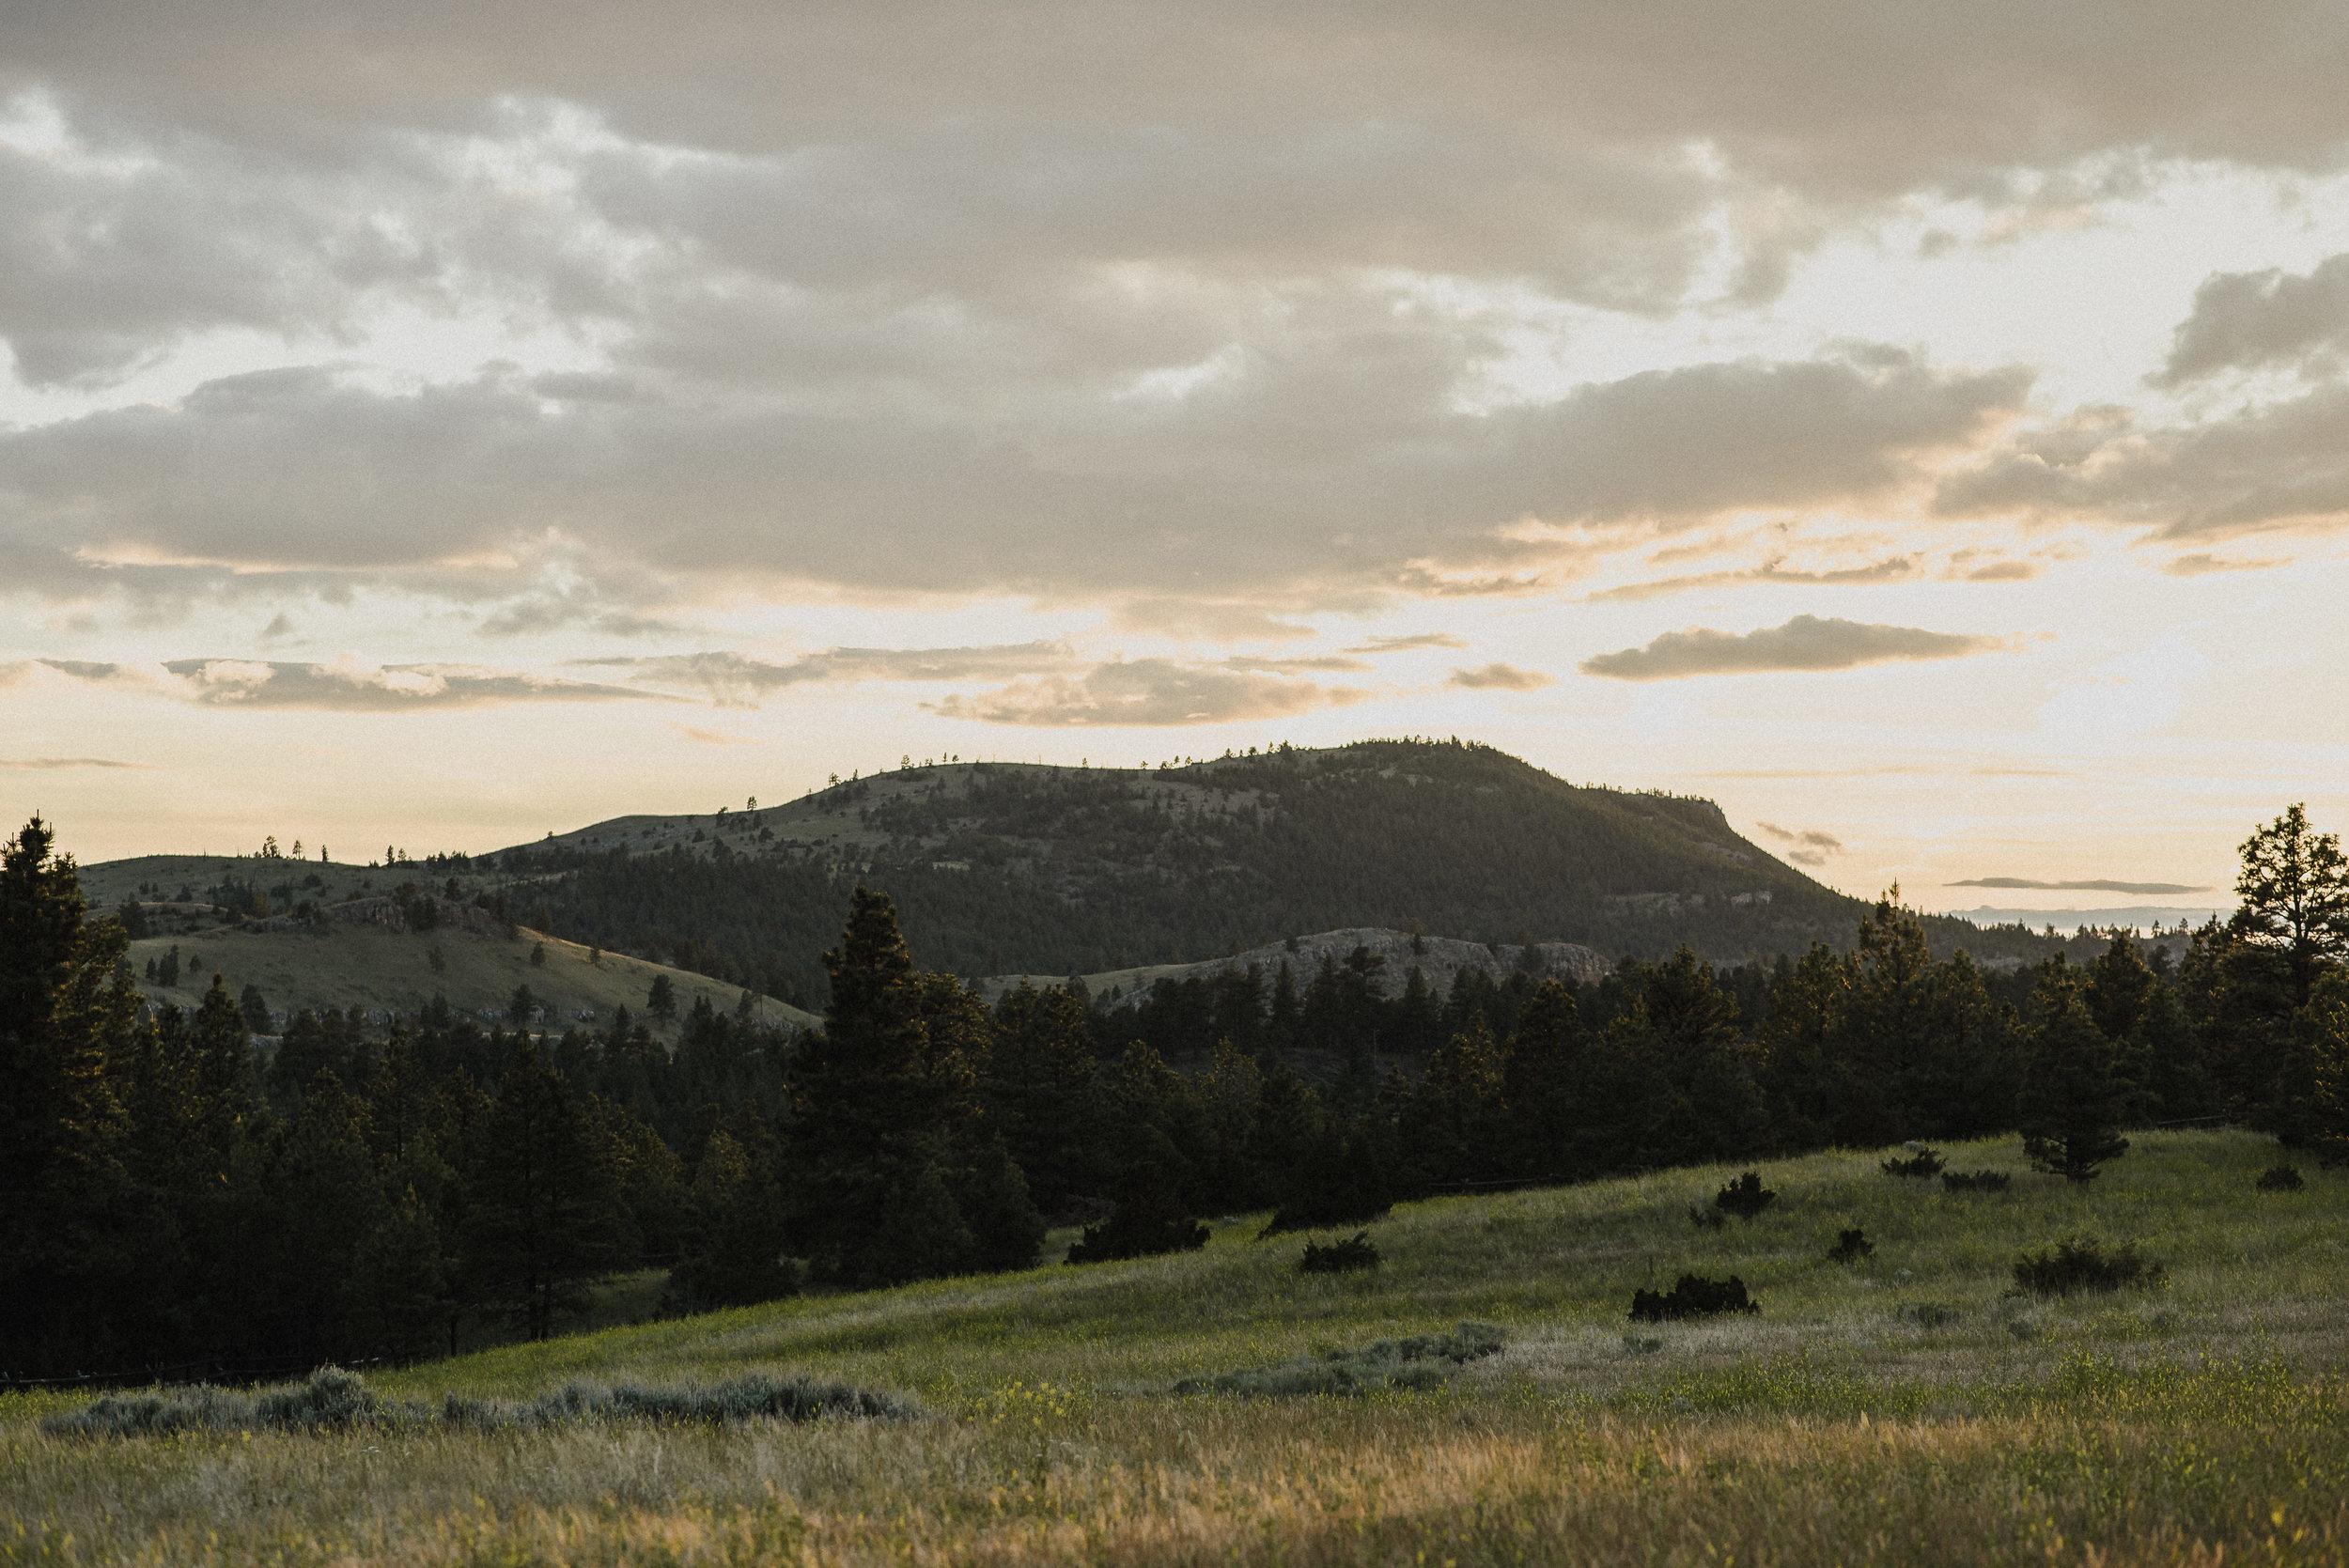 golden hour at summer star ranch